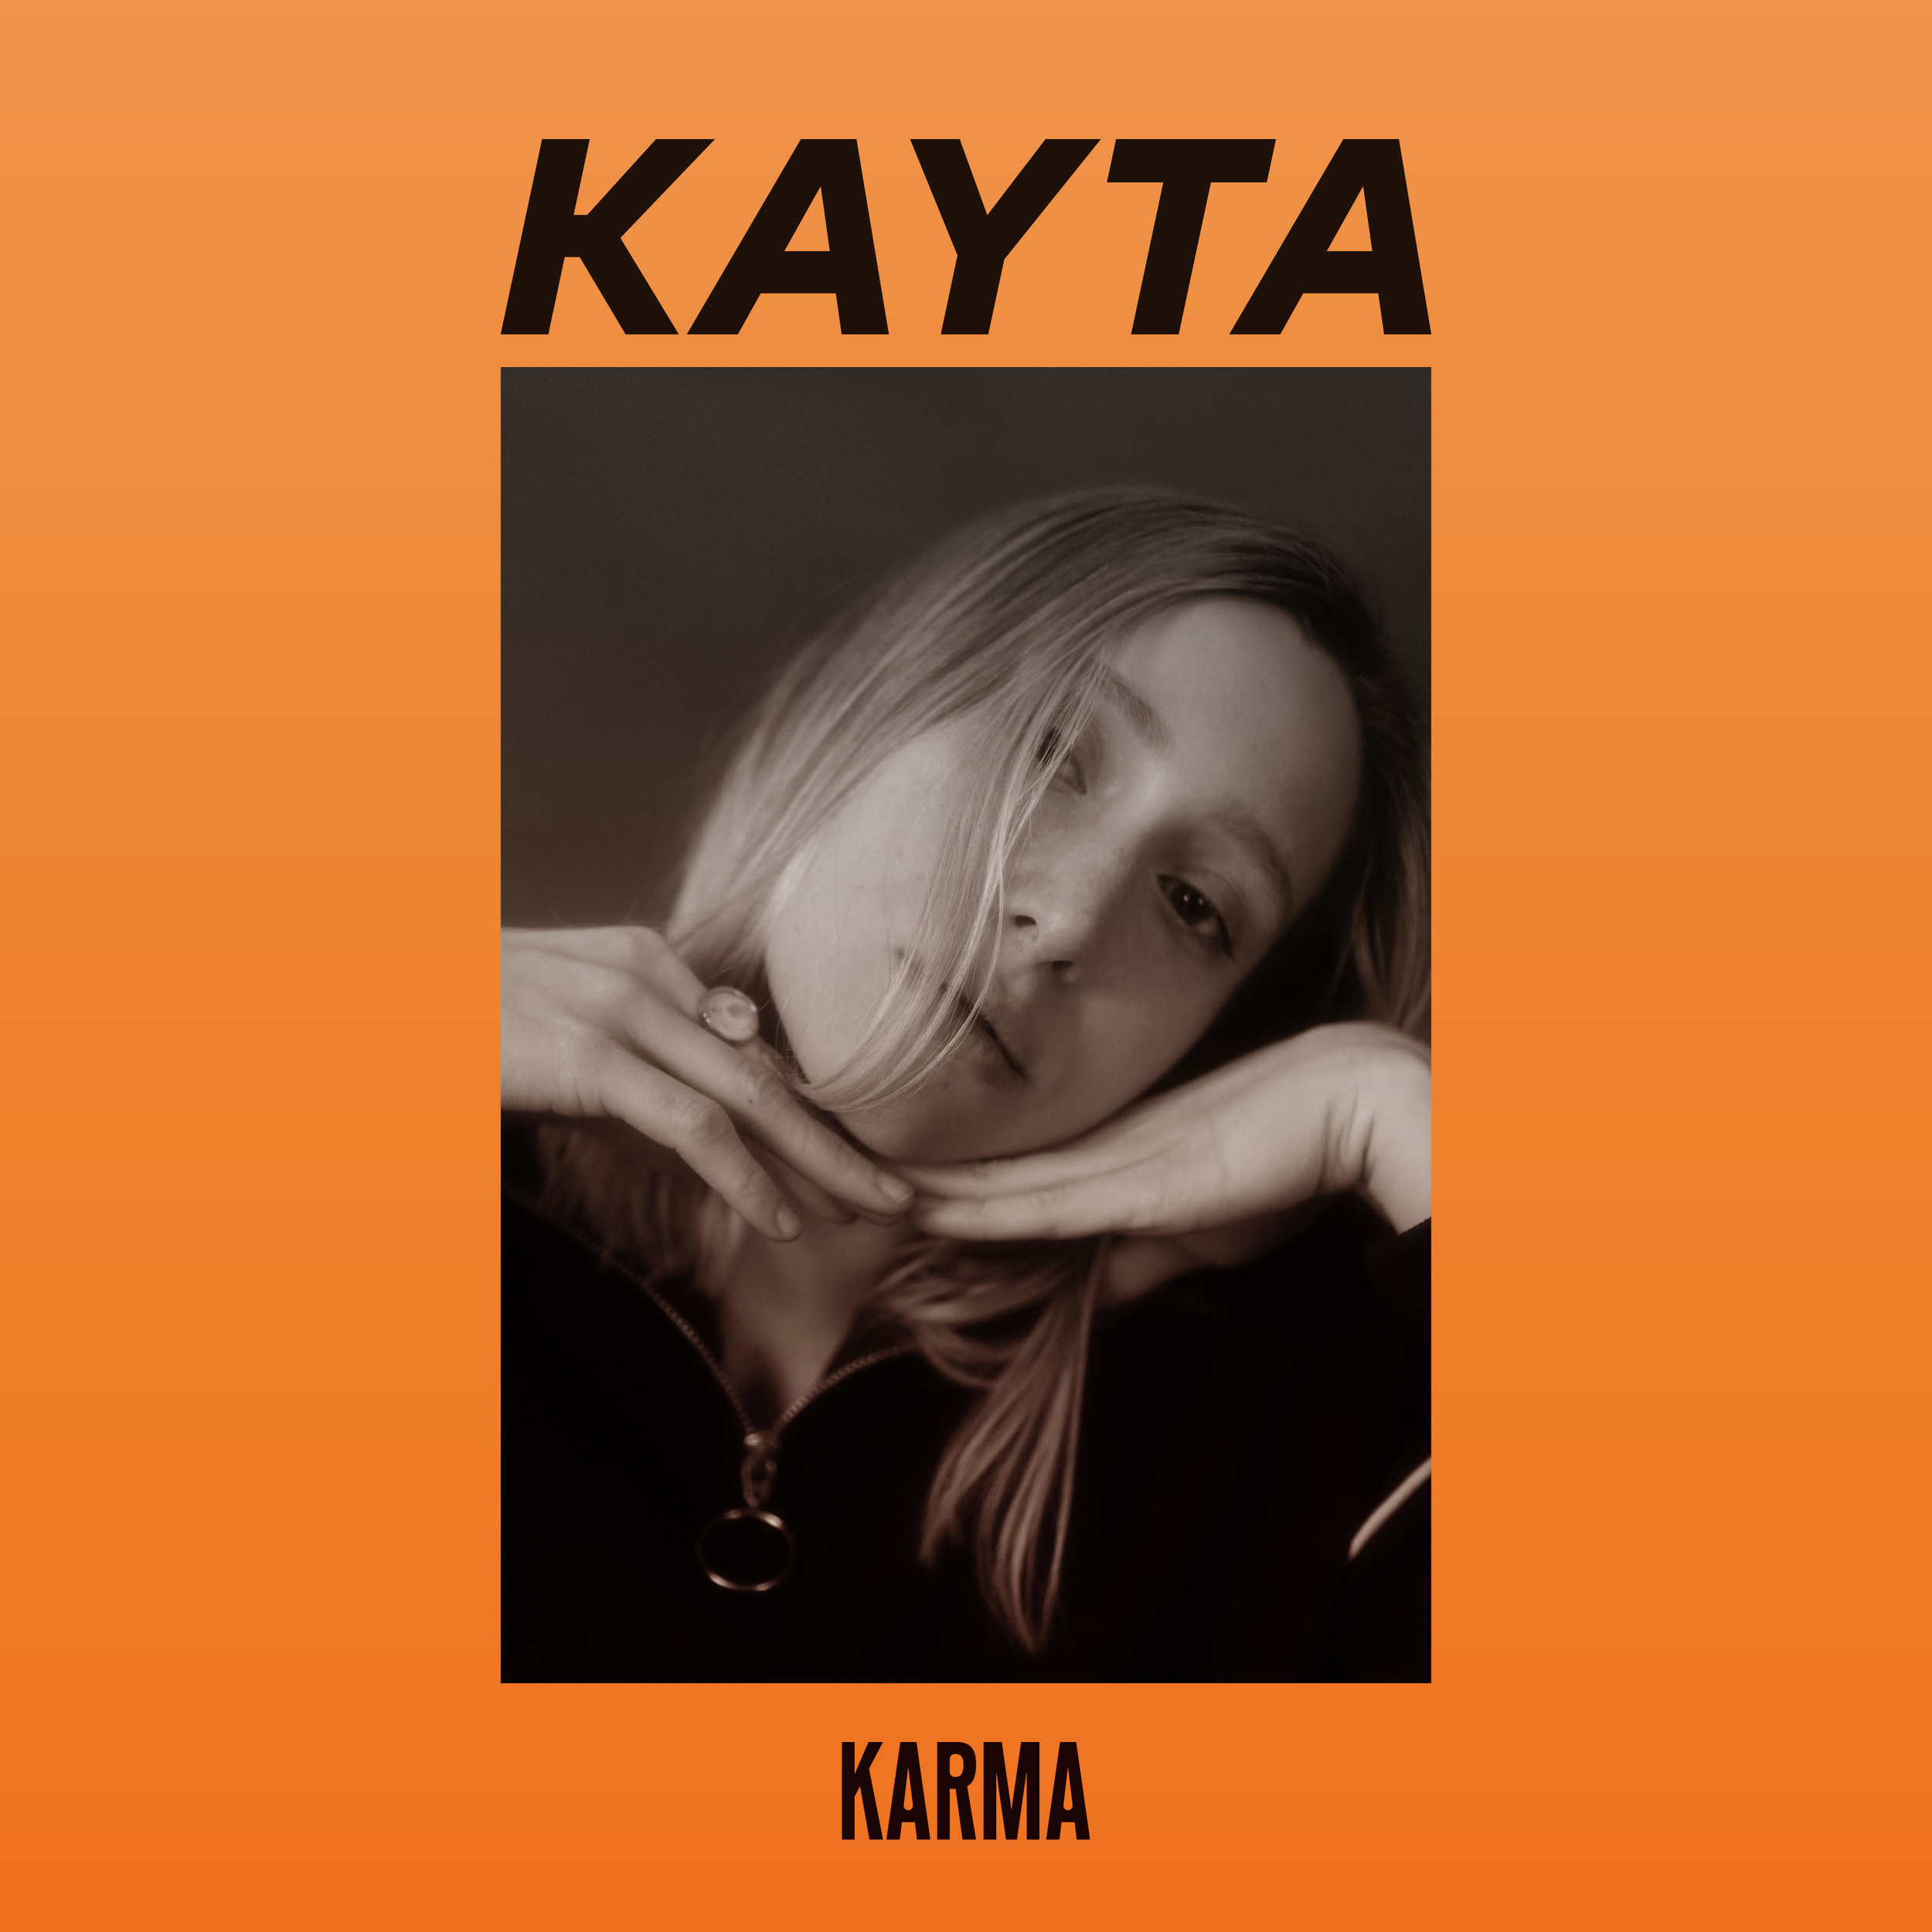 KARMA ART COVER.jpg